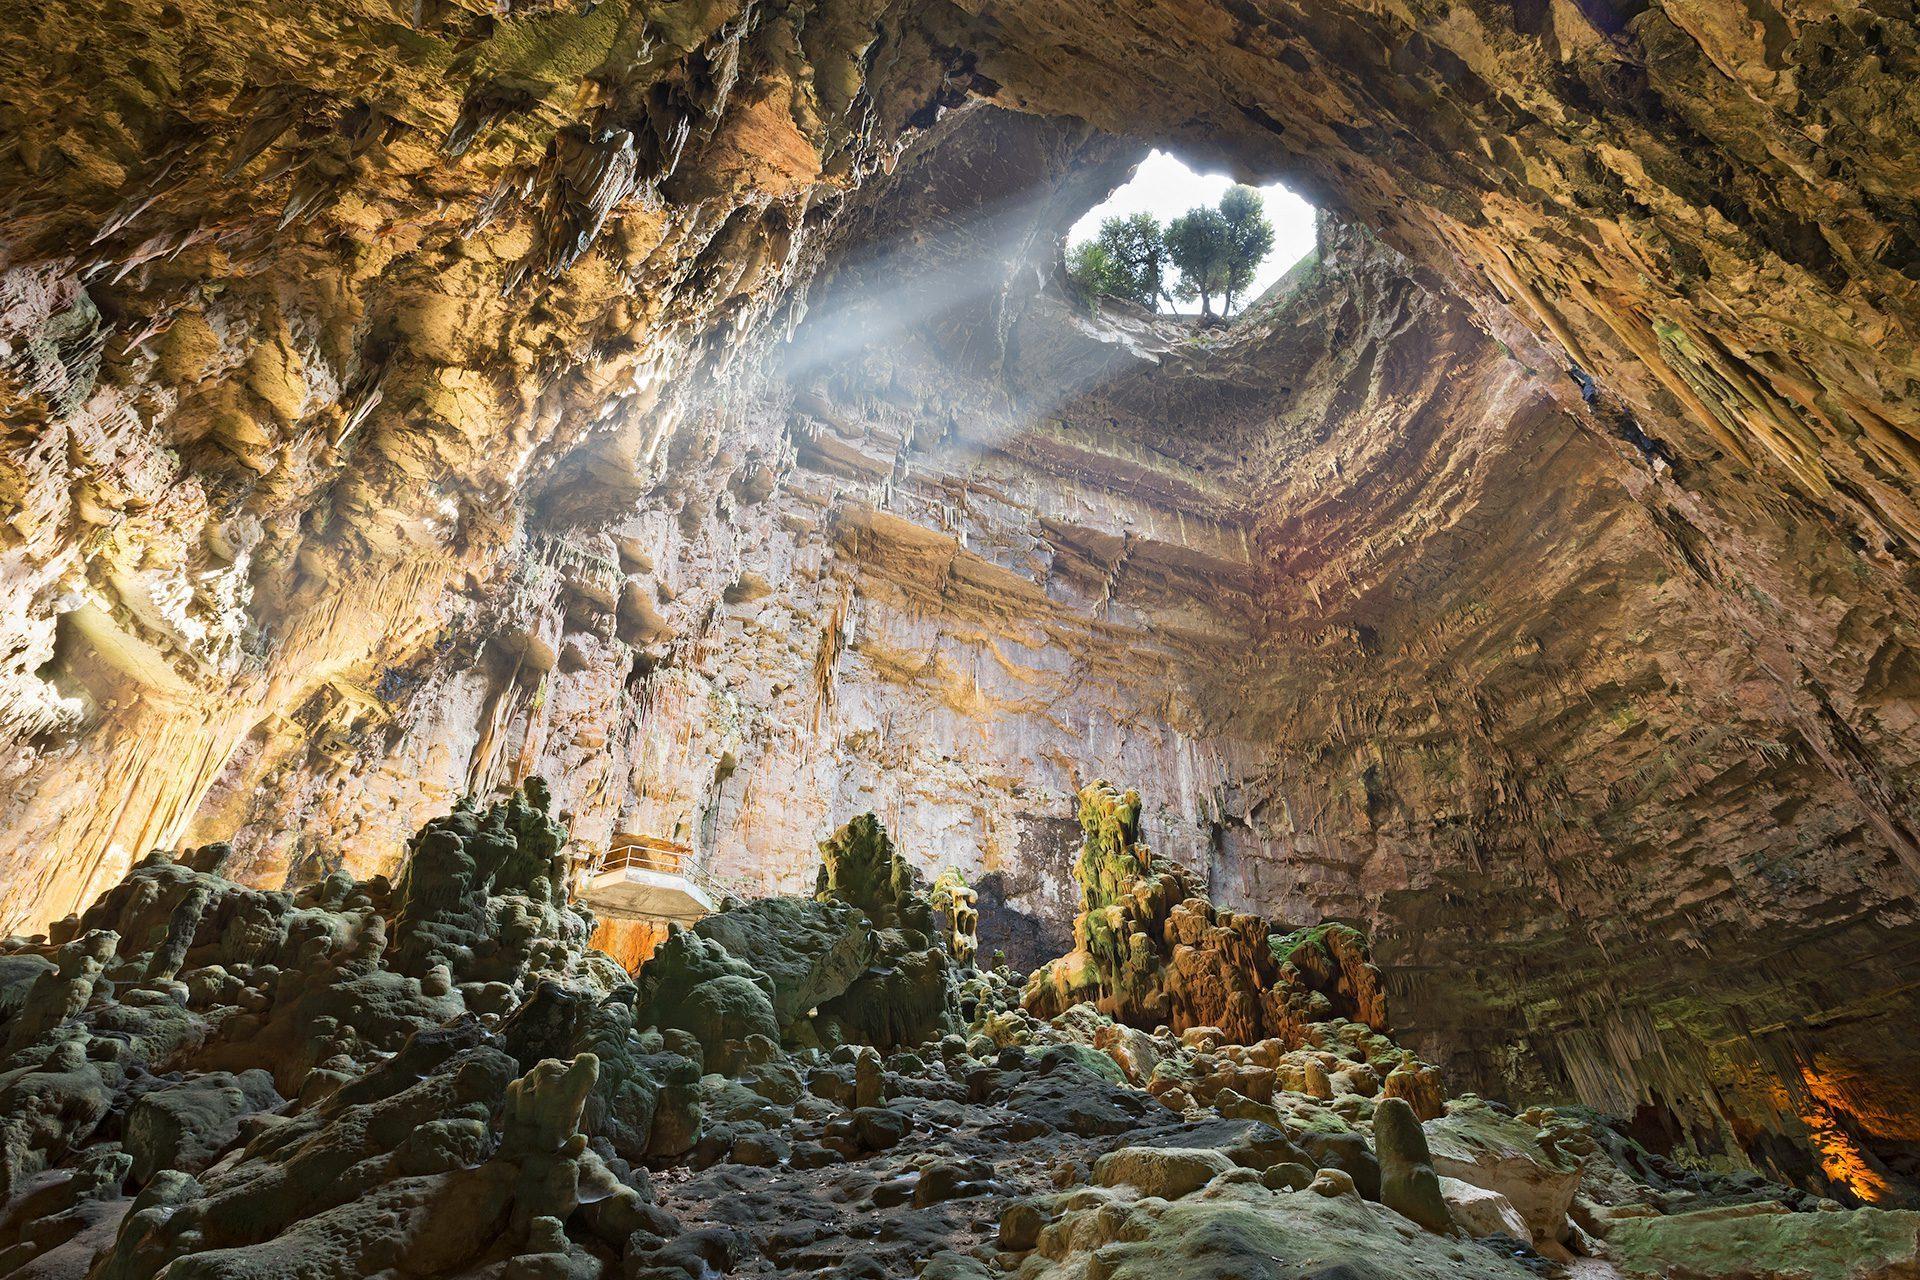 Risultati immagini per grotte di castellana